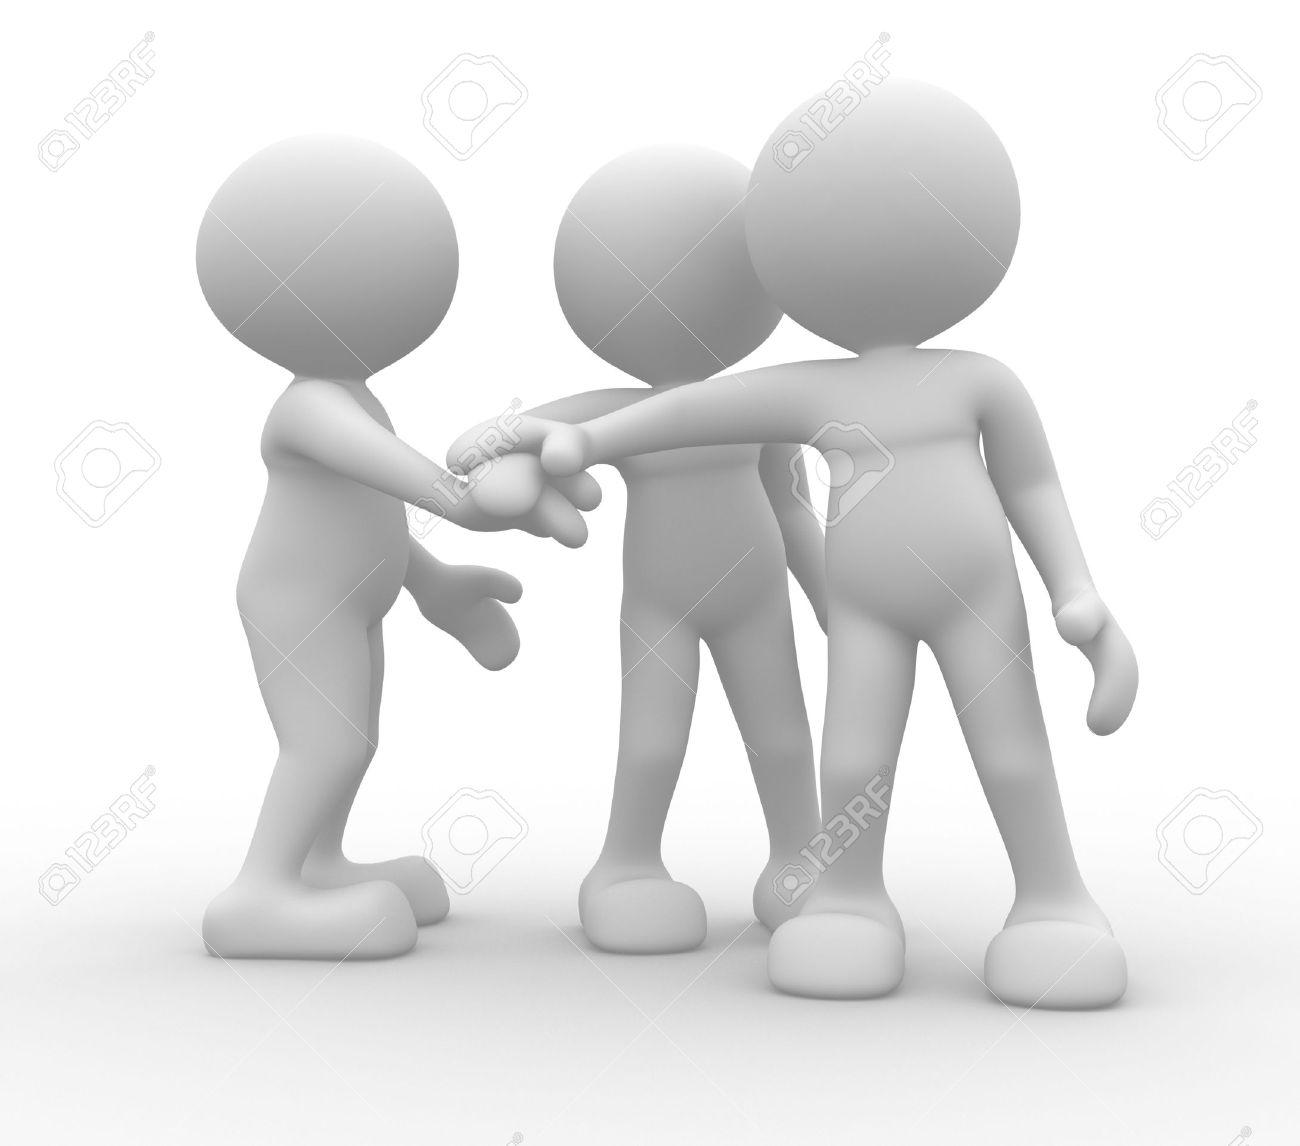 3d people - men, person together. Business team joining hands concept Standard-Bild - 17639973